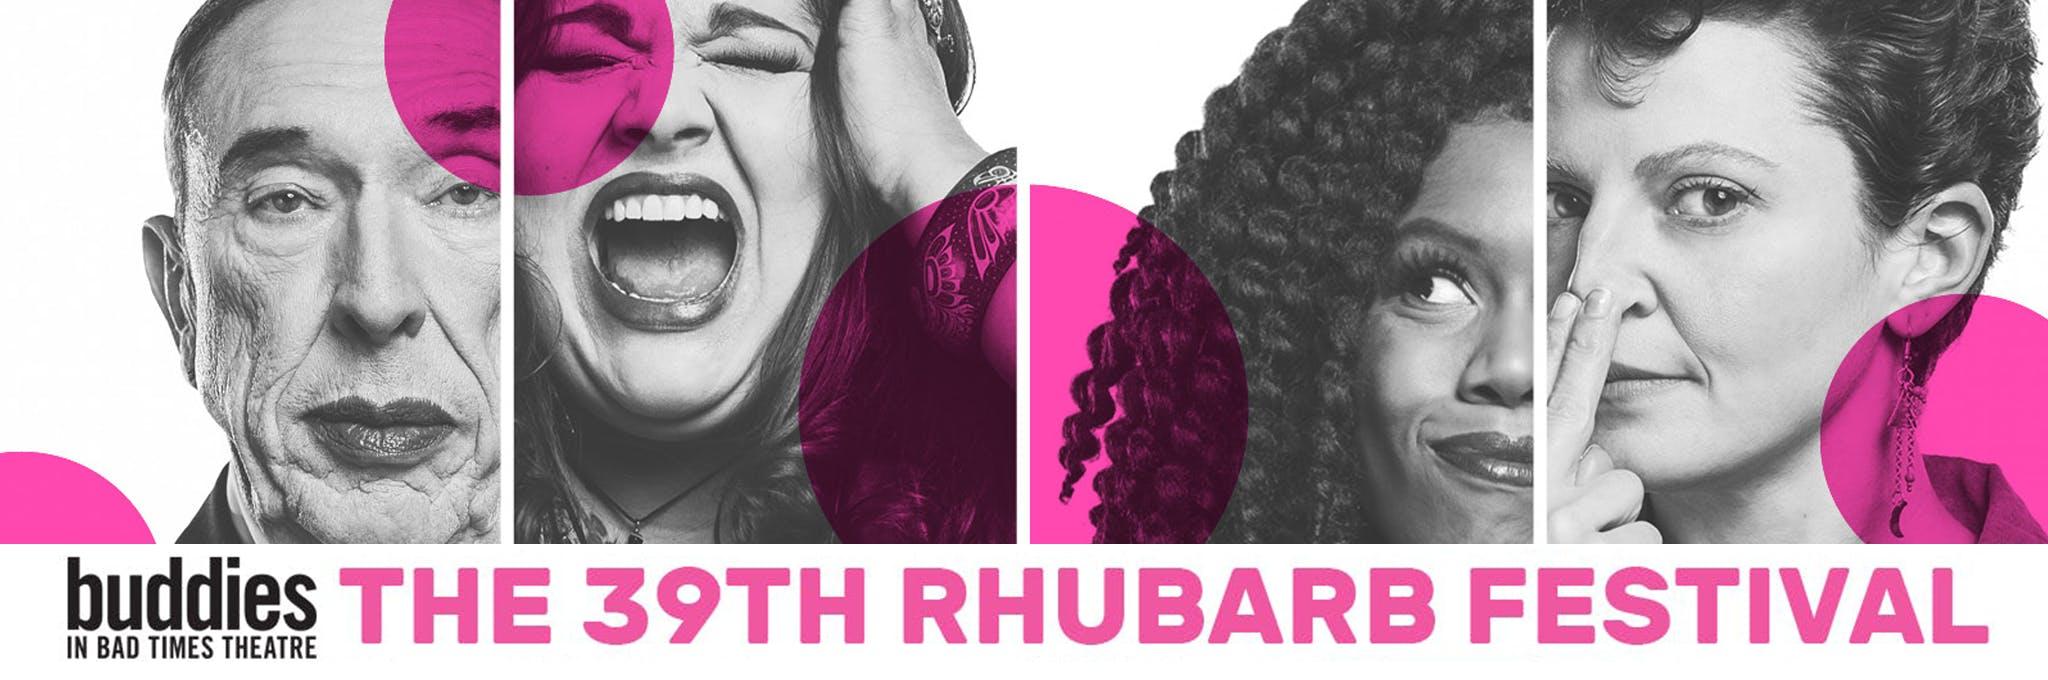 The 39th Rhubarb Festival Logo